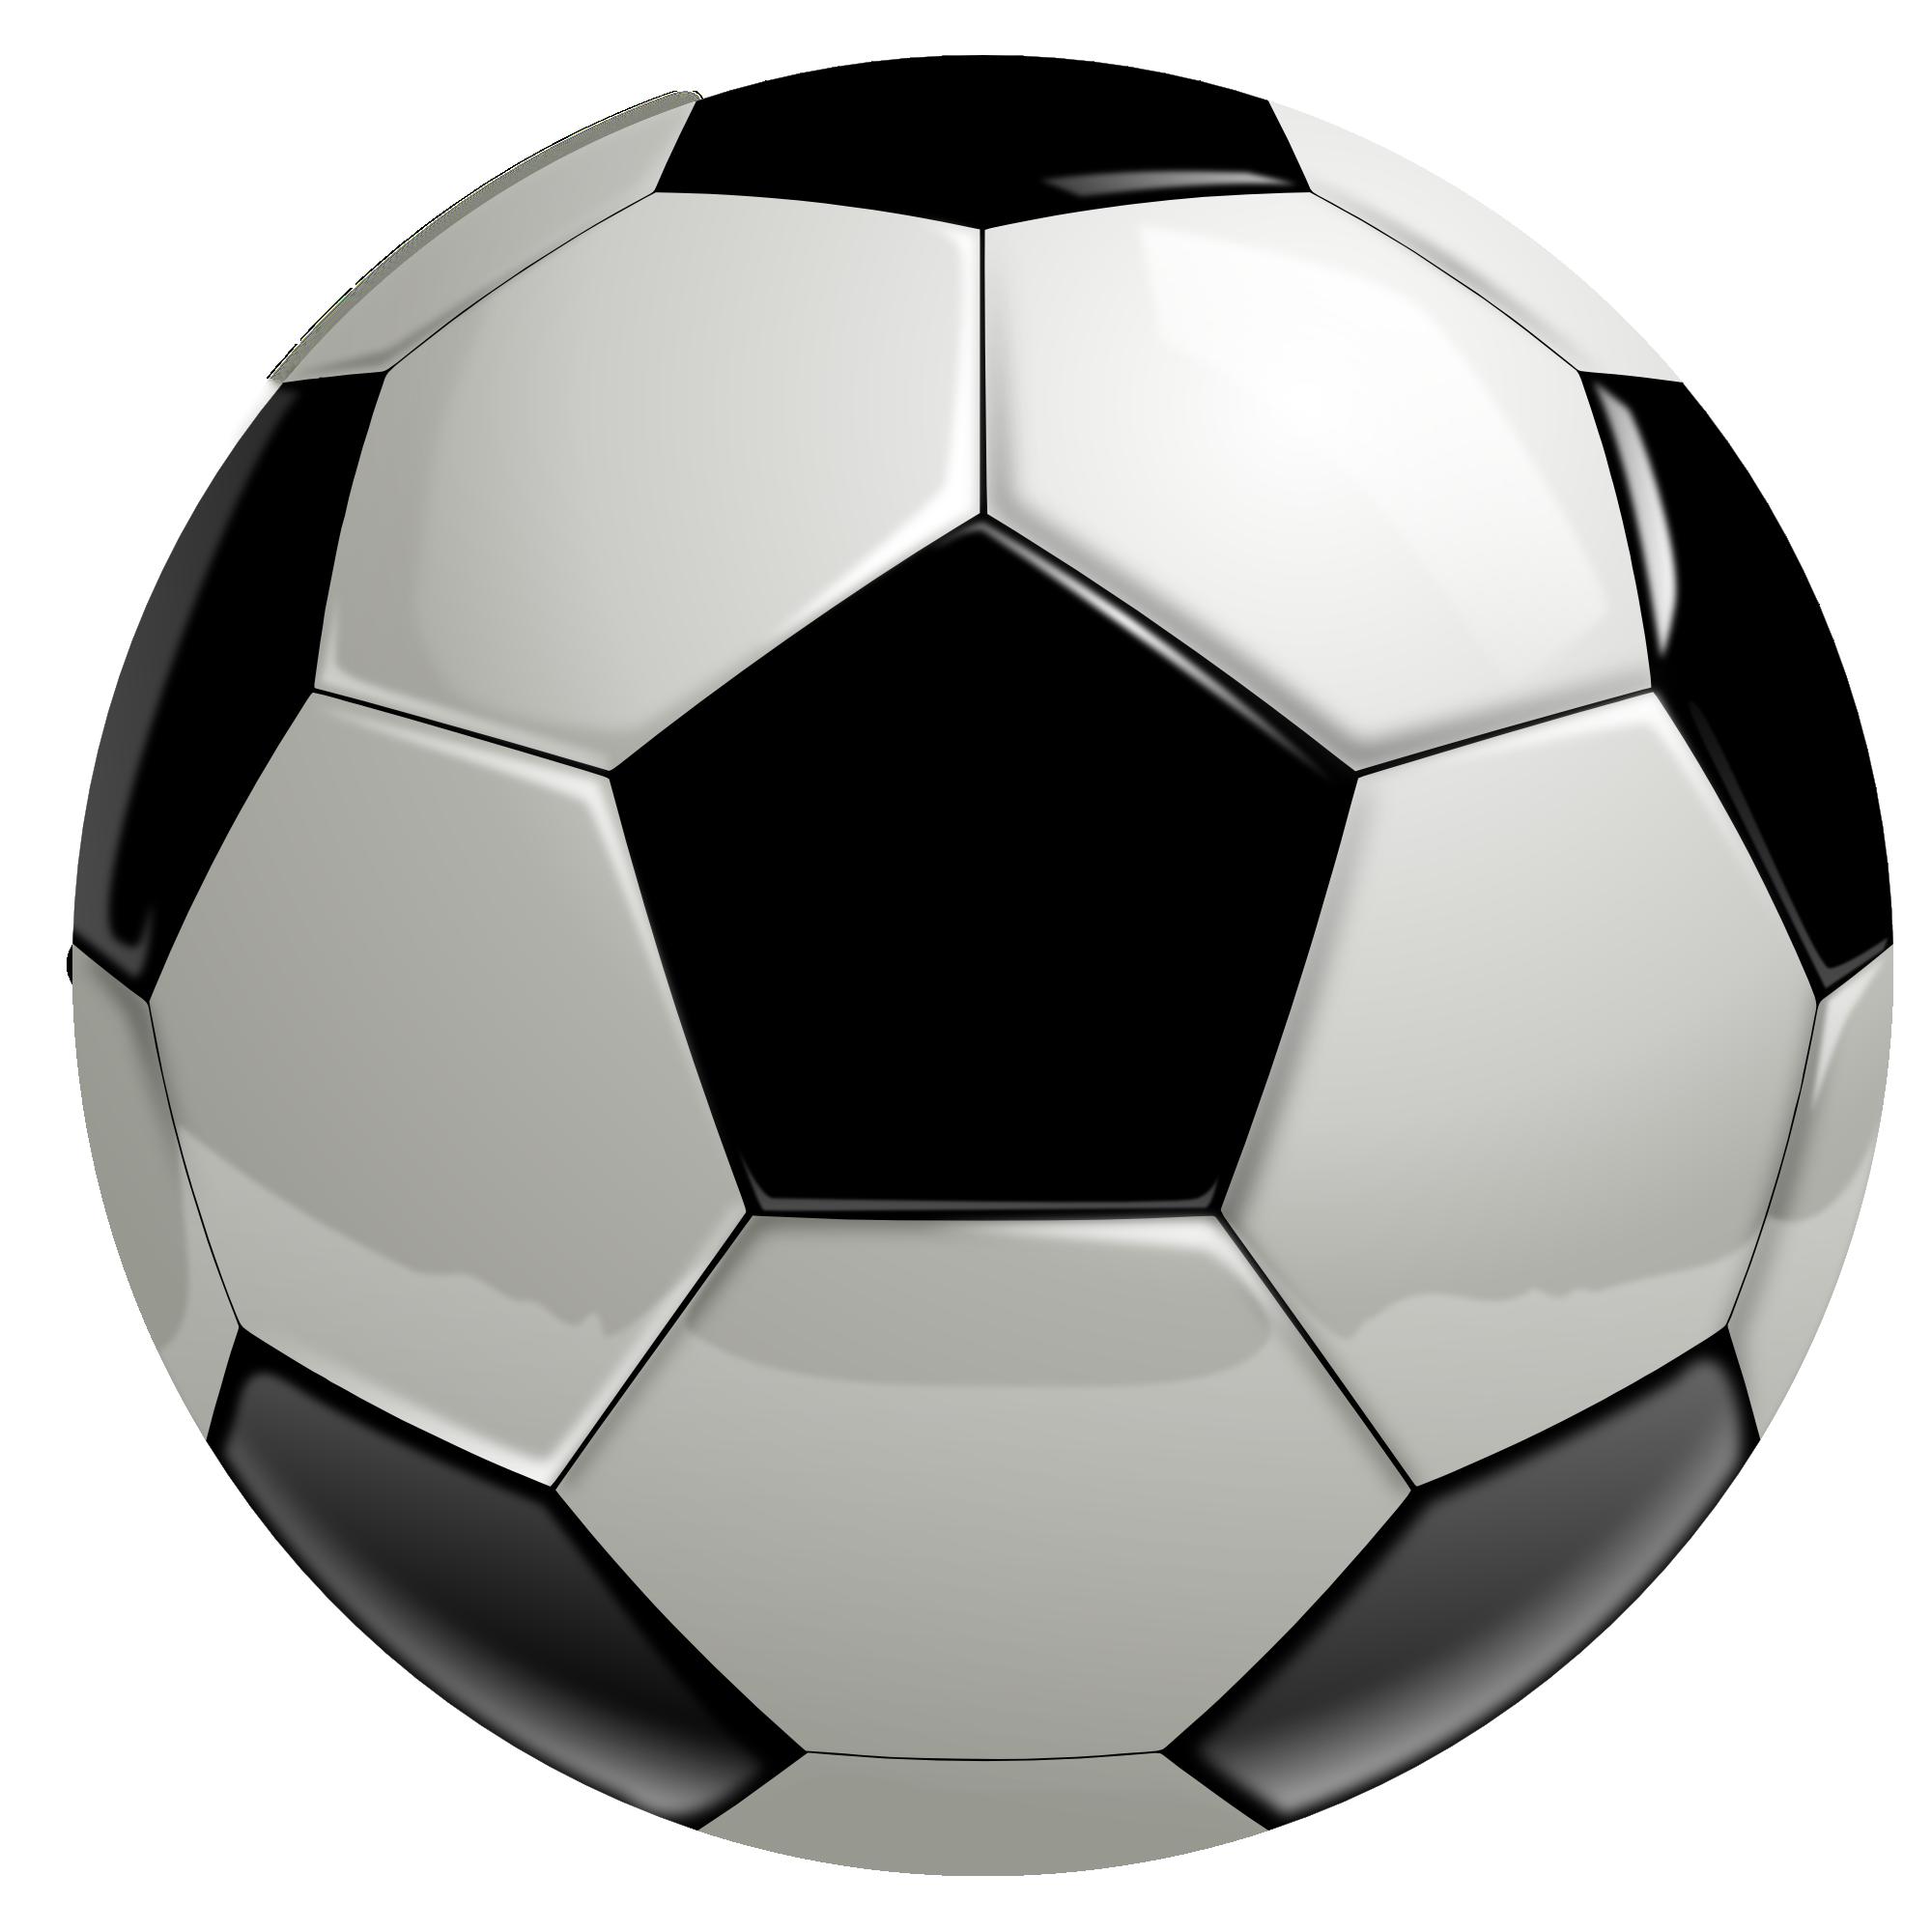 2000x2000 Soccer Ball Transparent Png